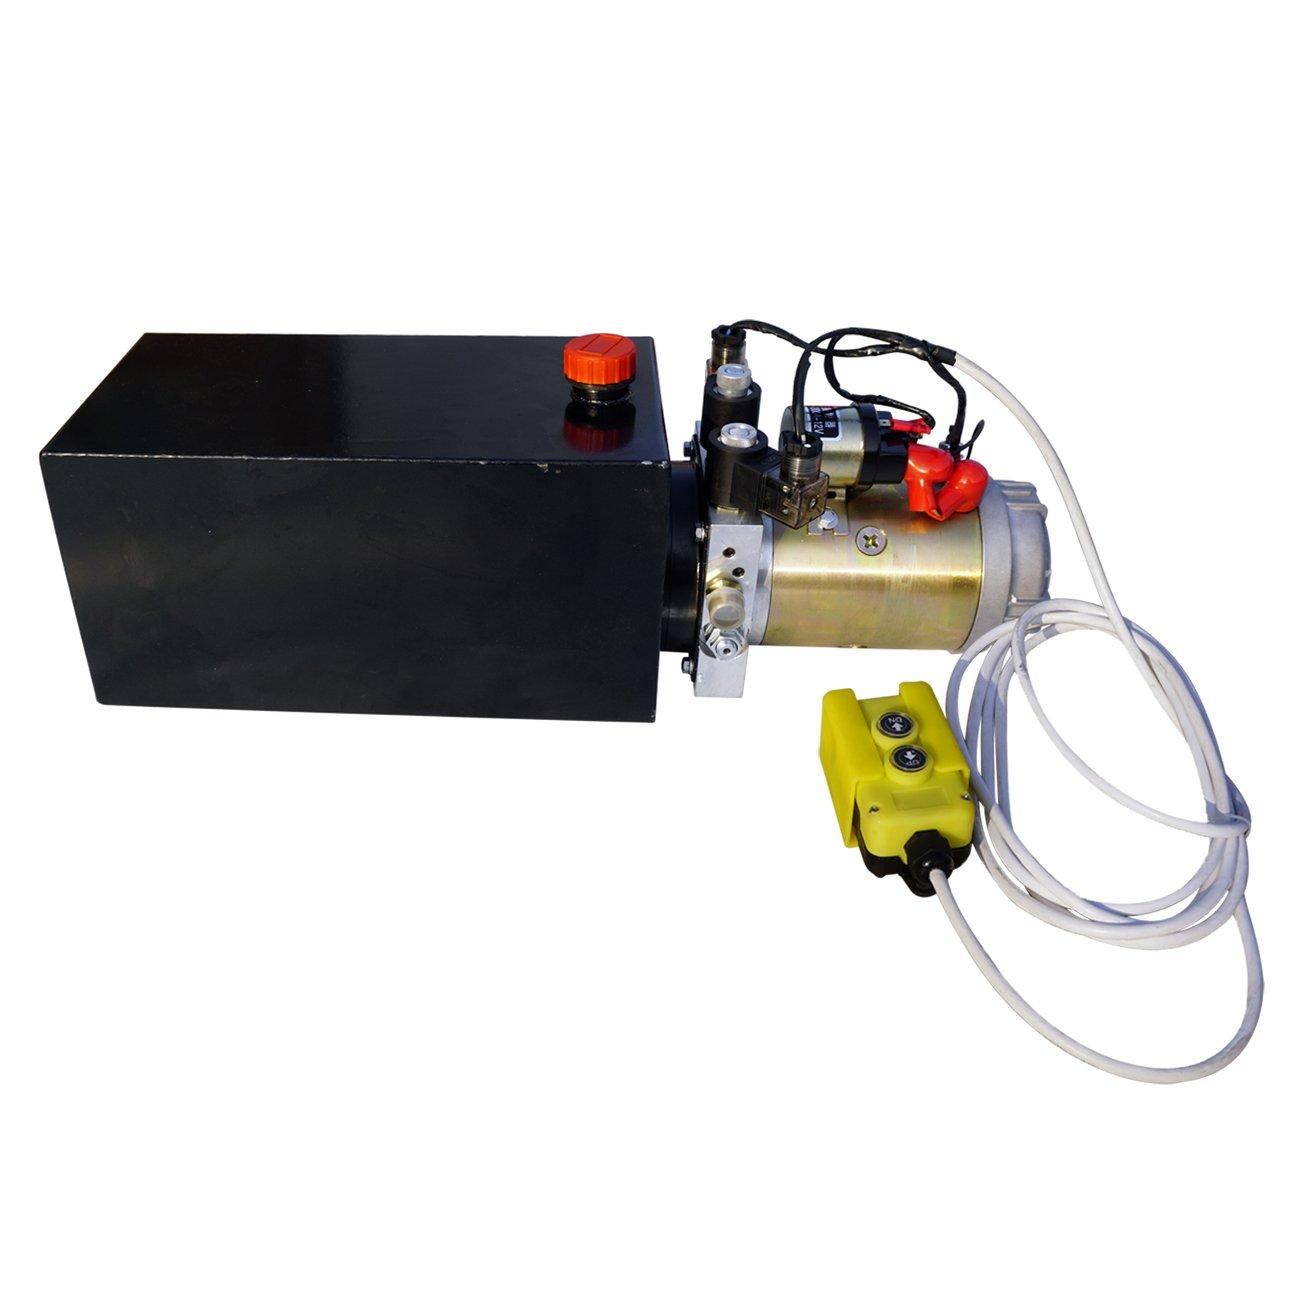 ECO-worthy 10 クォット 12V 油圧ポンプ電源+リフトリフティング用金属リザーバ B01N2P7KUQ